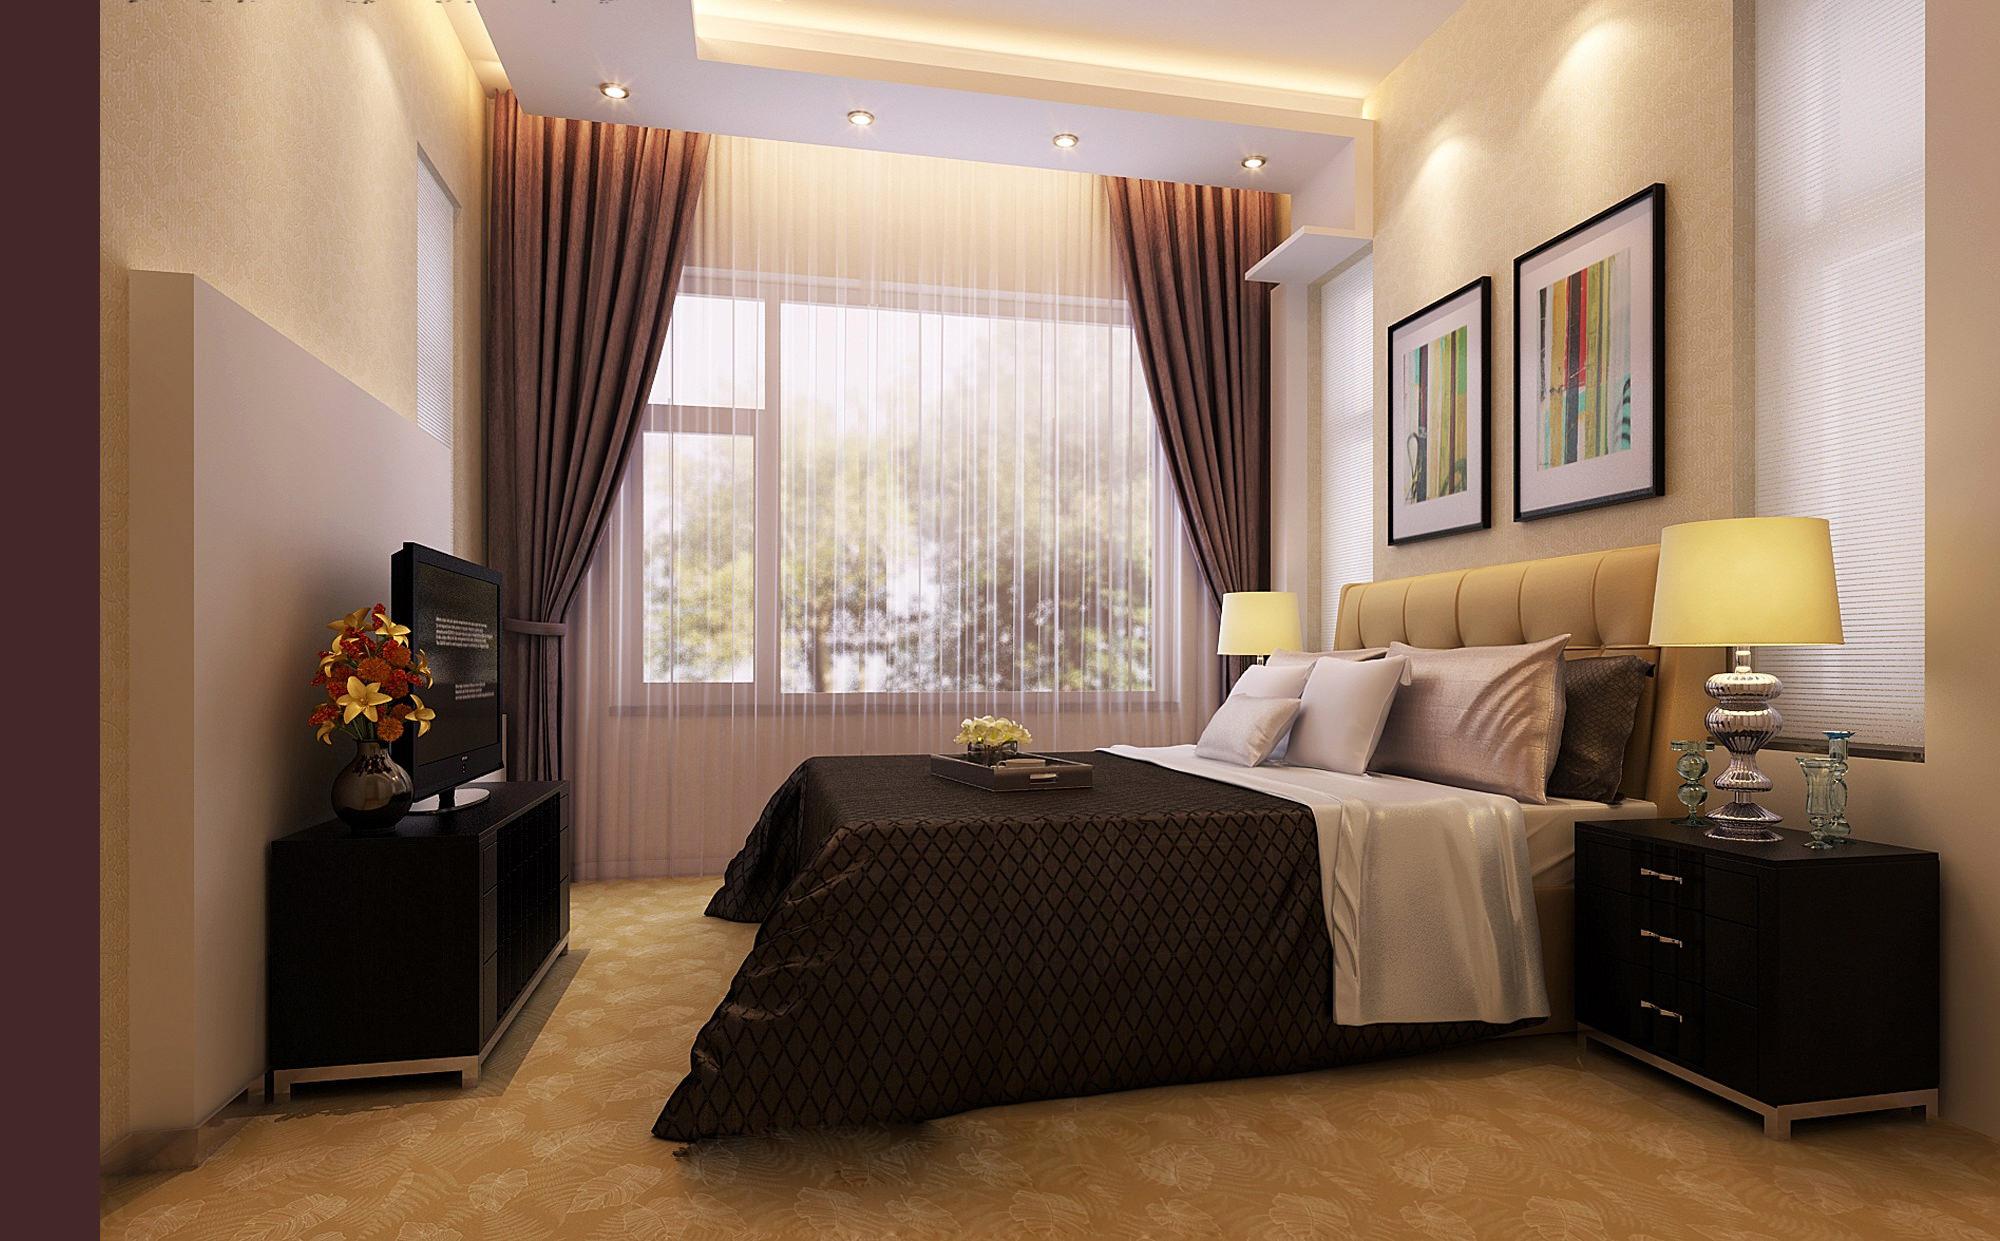 Modern Design Cosy Bedroom 3D Model .max - CGTrader.com on New Model Bedroom Design  id=99533